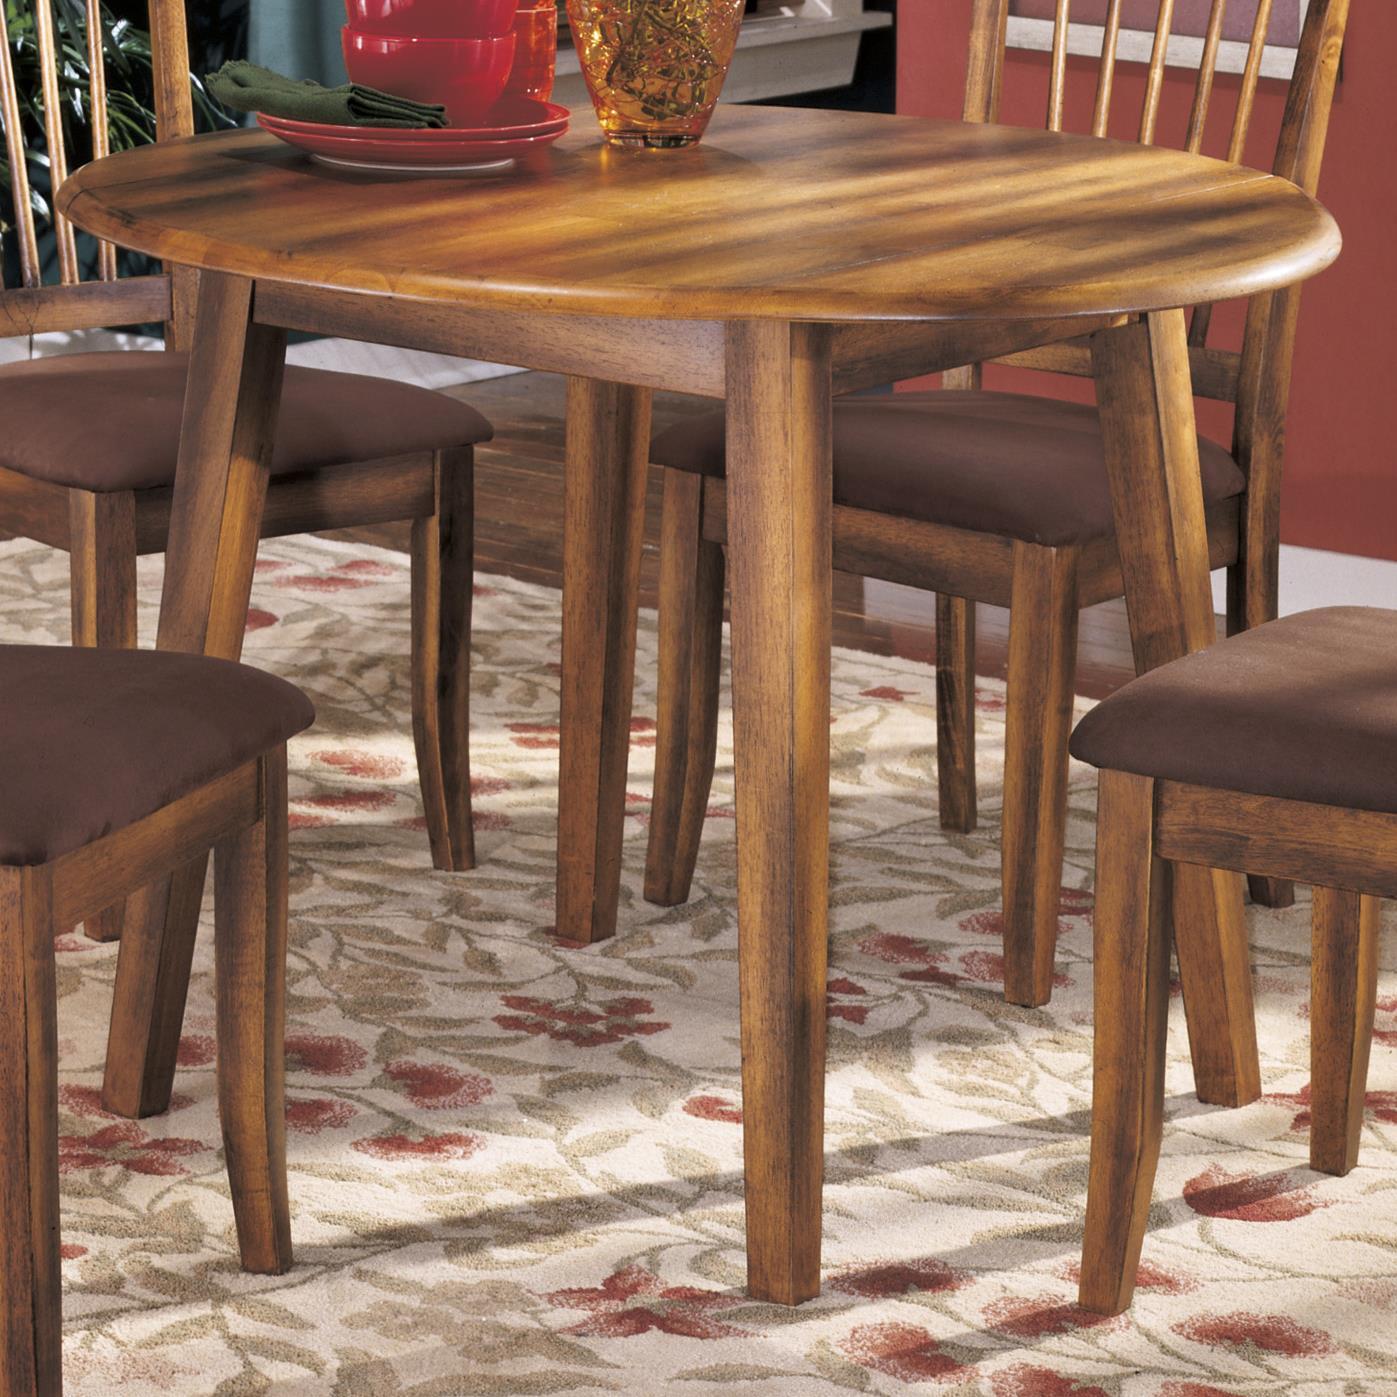 Merveilleux Ashley Furniture Berringer Hickory Stained Hardwood Round Drop Leaf Table |  Bullard Furniture | Kitchen Tables Fayetteville, NC